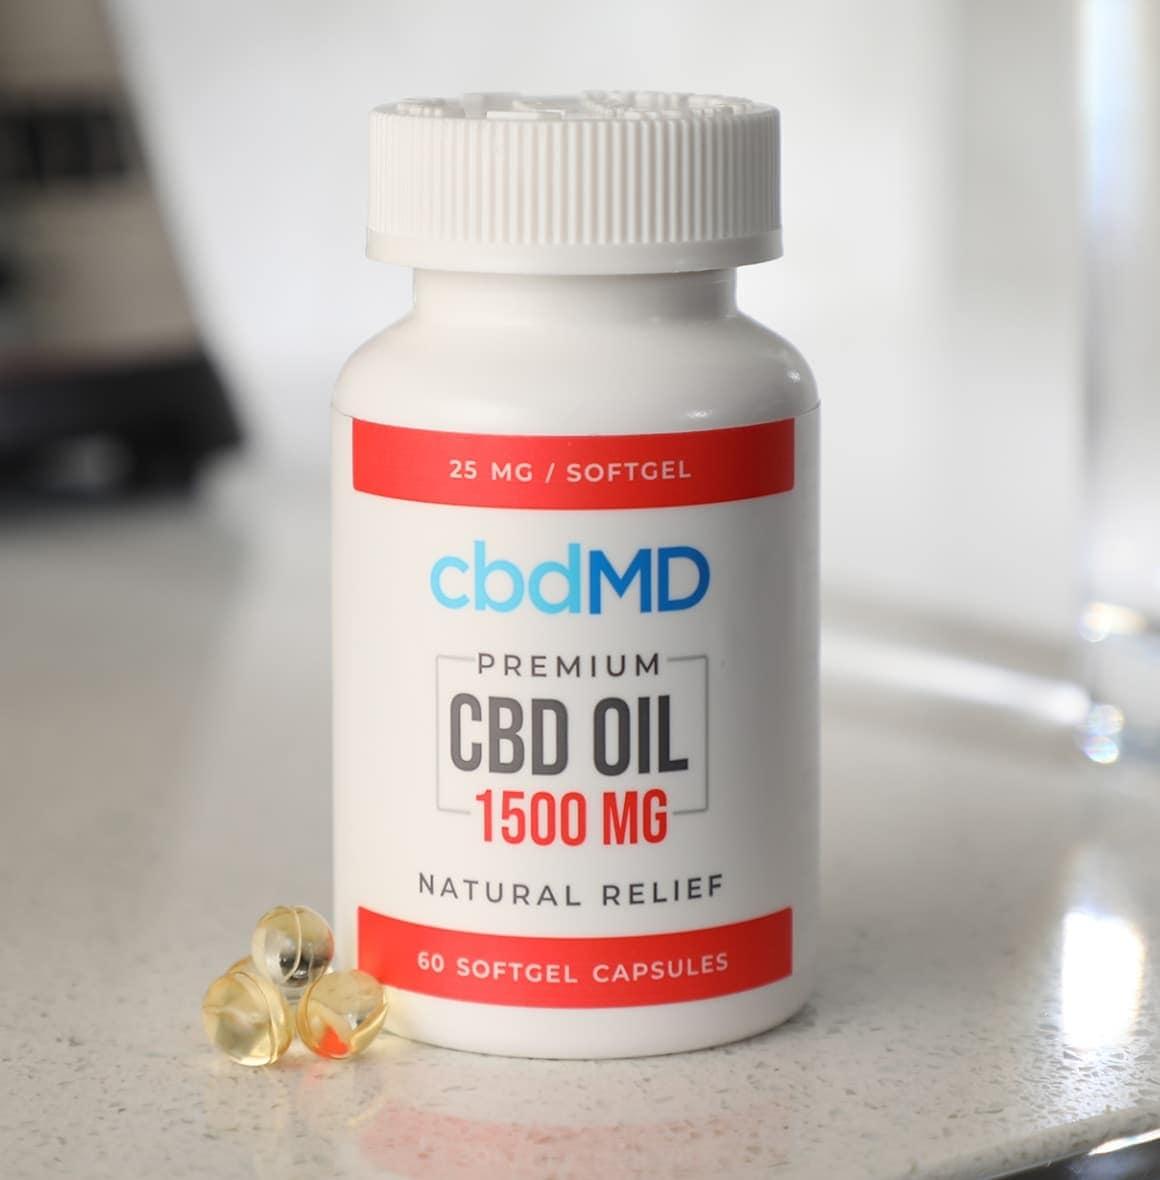 cbdMD, CBD Oil Softgel Capsules, Broad Spectrum THC-Free, 60-Count, 1500mg of CBD3